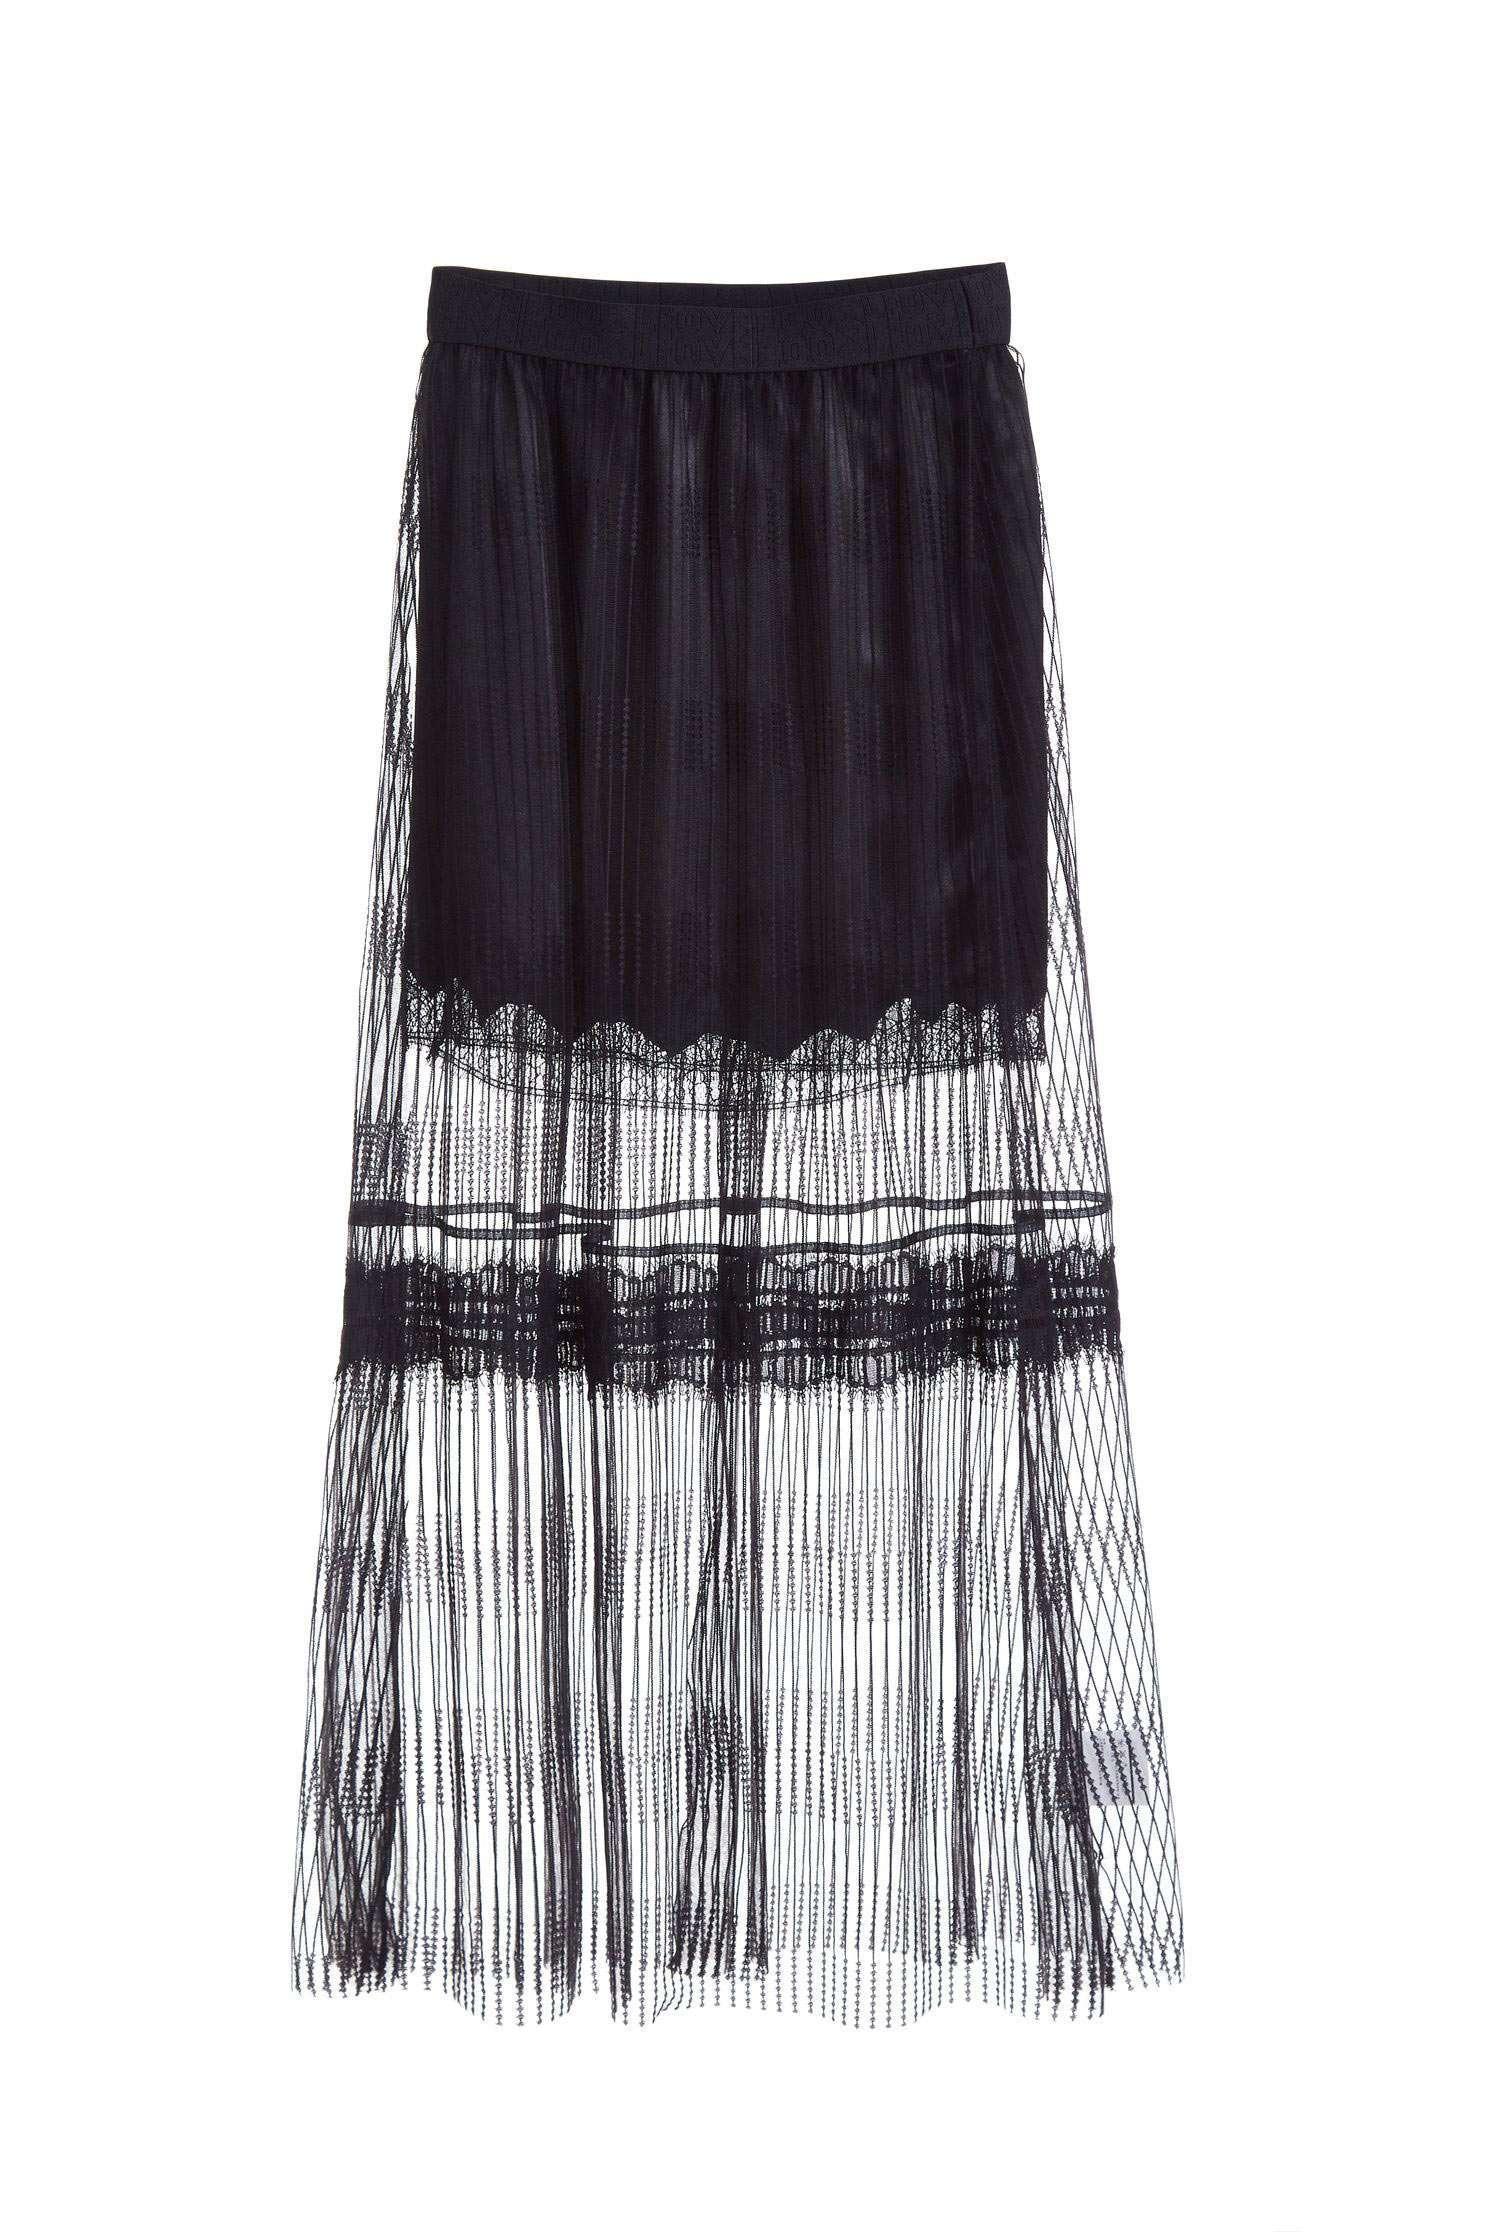 Translucent elastic fashion long skirt